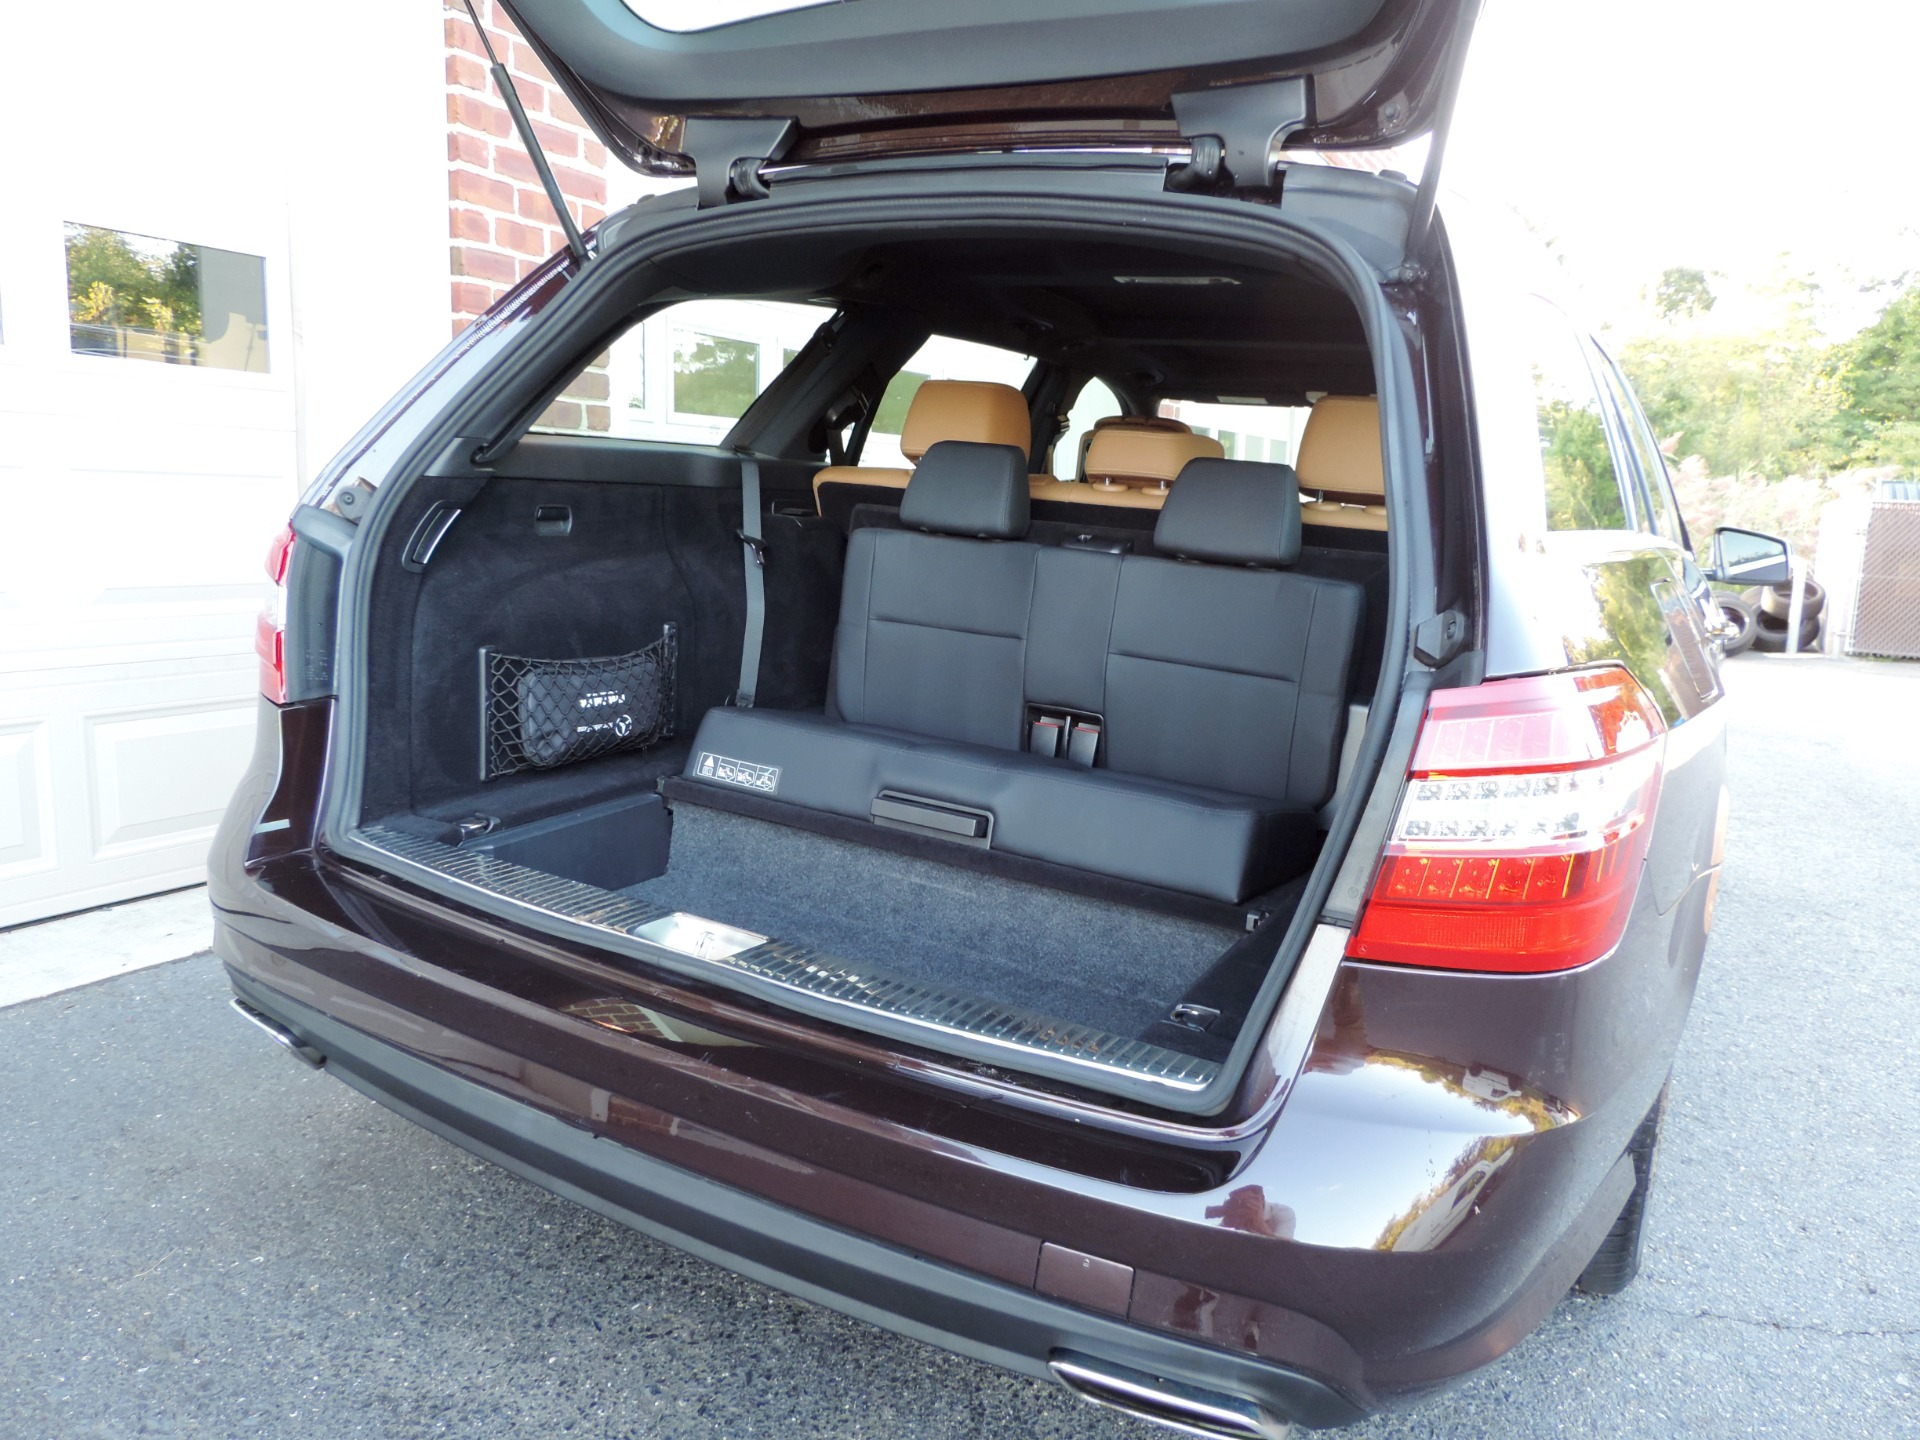 2011 mercedes benz e class e 350 4matic sport wagon stock for 2011 mercedes benz e350 4matic wagon for sale